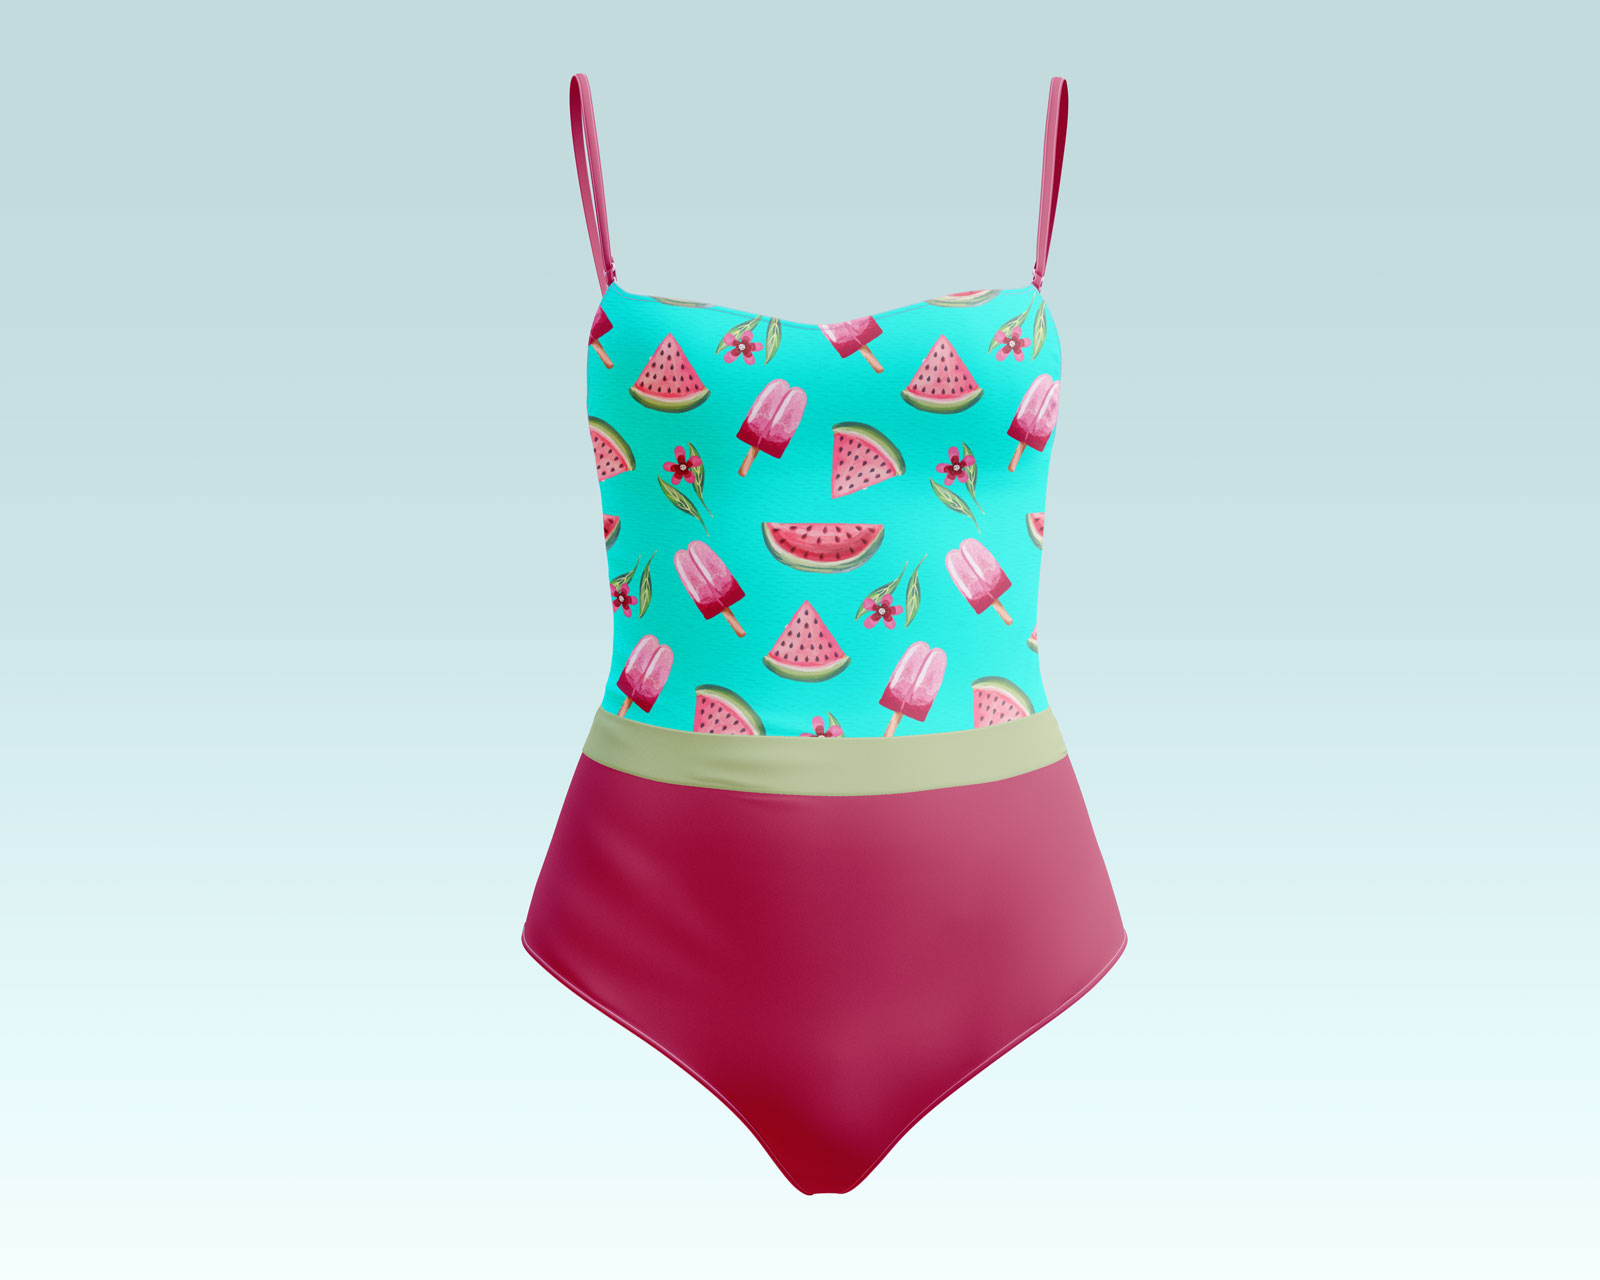 Free Women's One Piece Swimsuit Mockup PSD Set